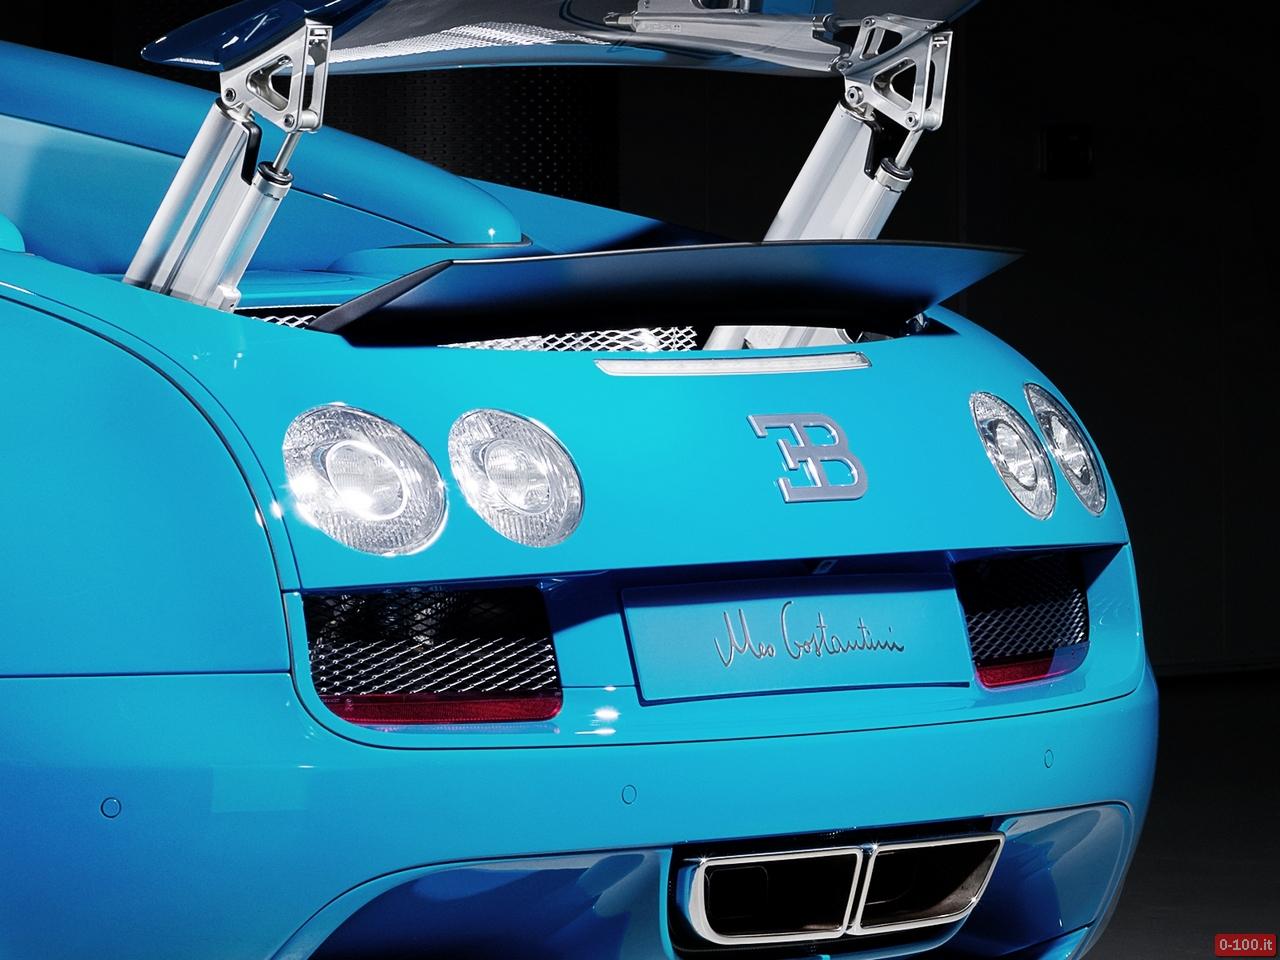 bugatti-veyron-grand-sport-vitesse-meo-costantini_0-100_17